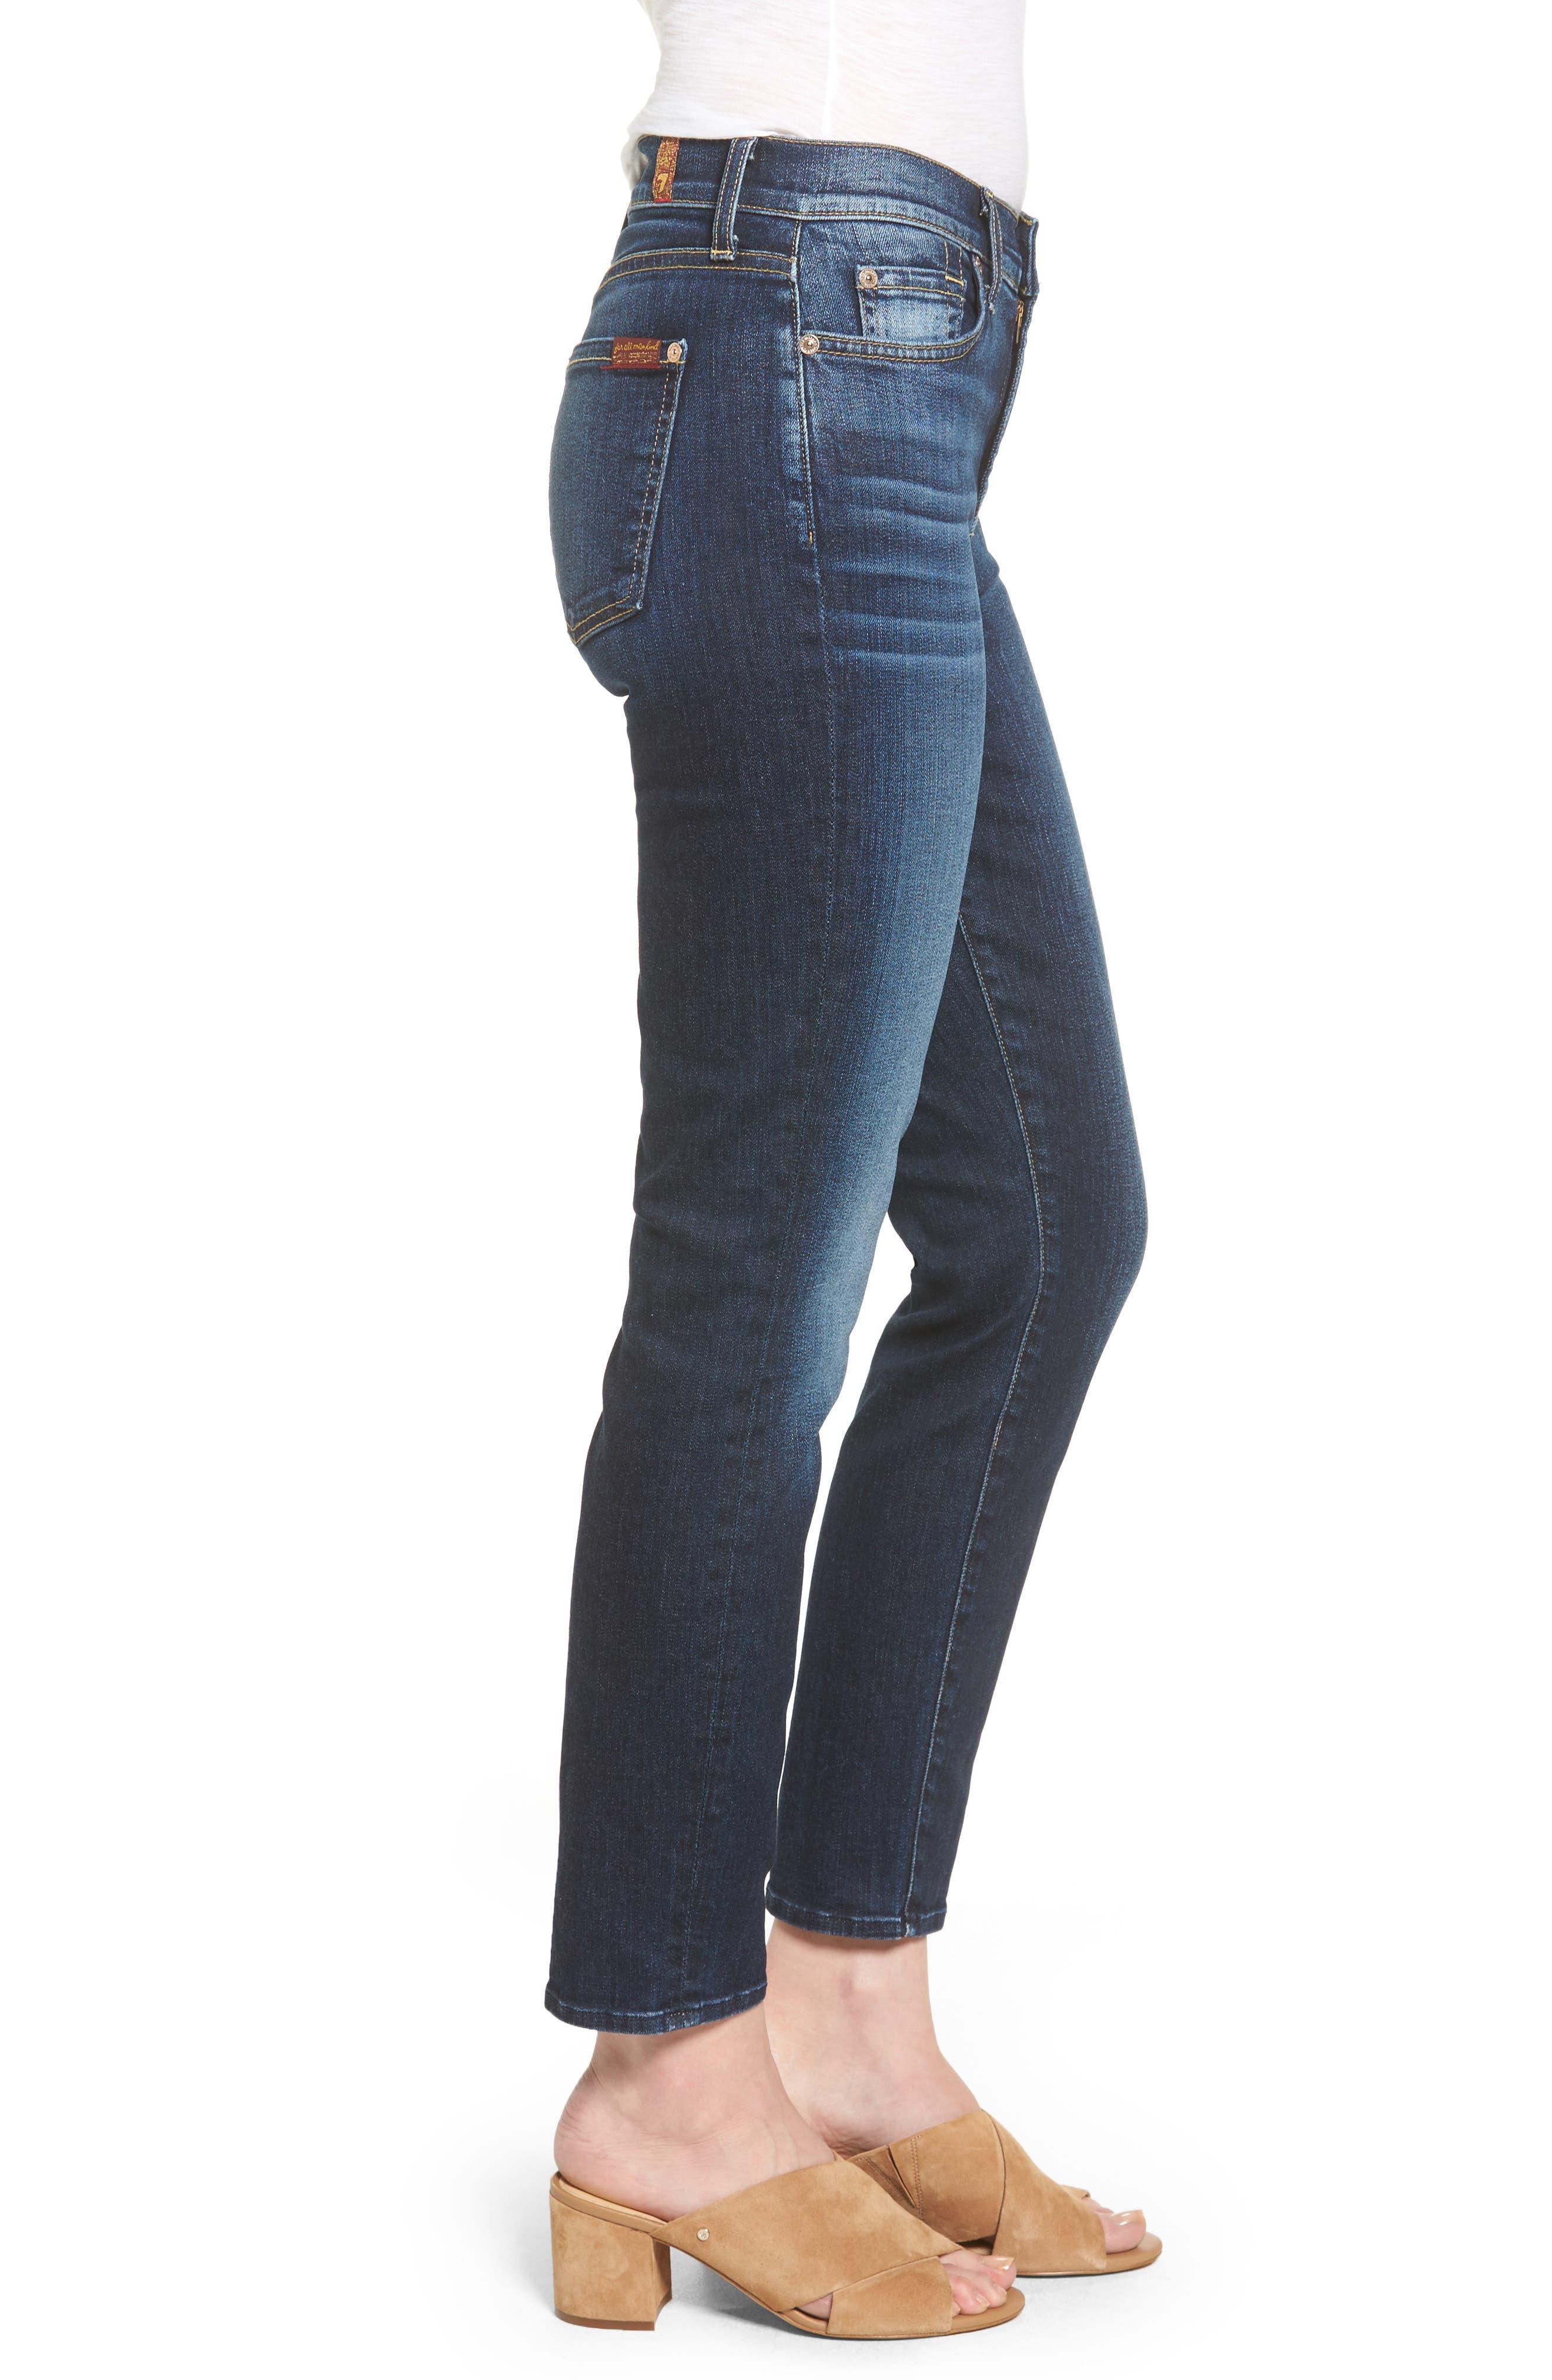 Seven7 Roxanne High Waist Ankle Jeans,                             Alternate thumbnail 3, color,                             Aggressive Madison Ave